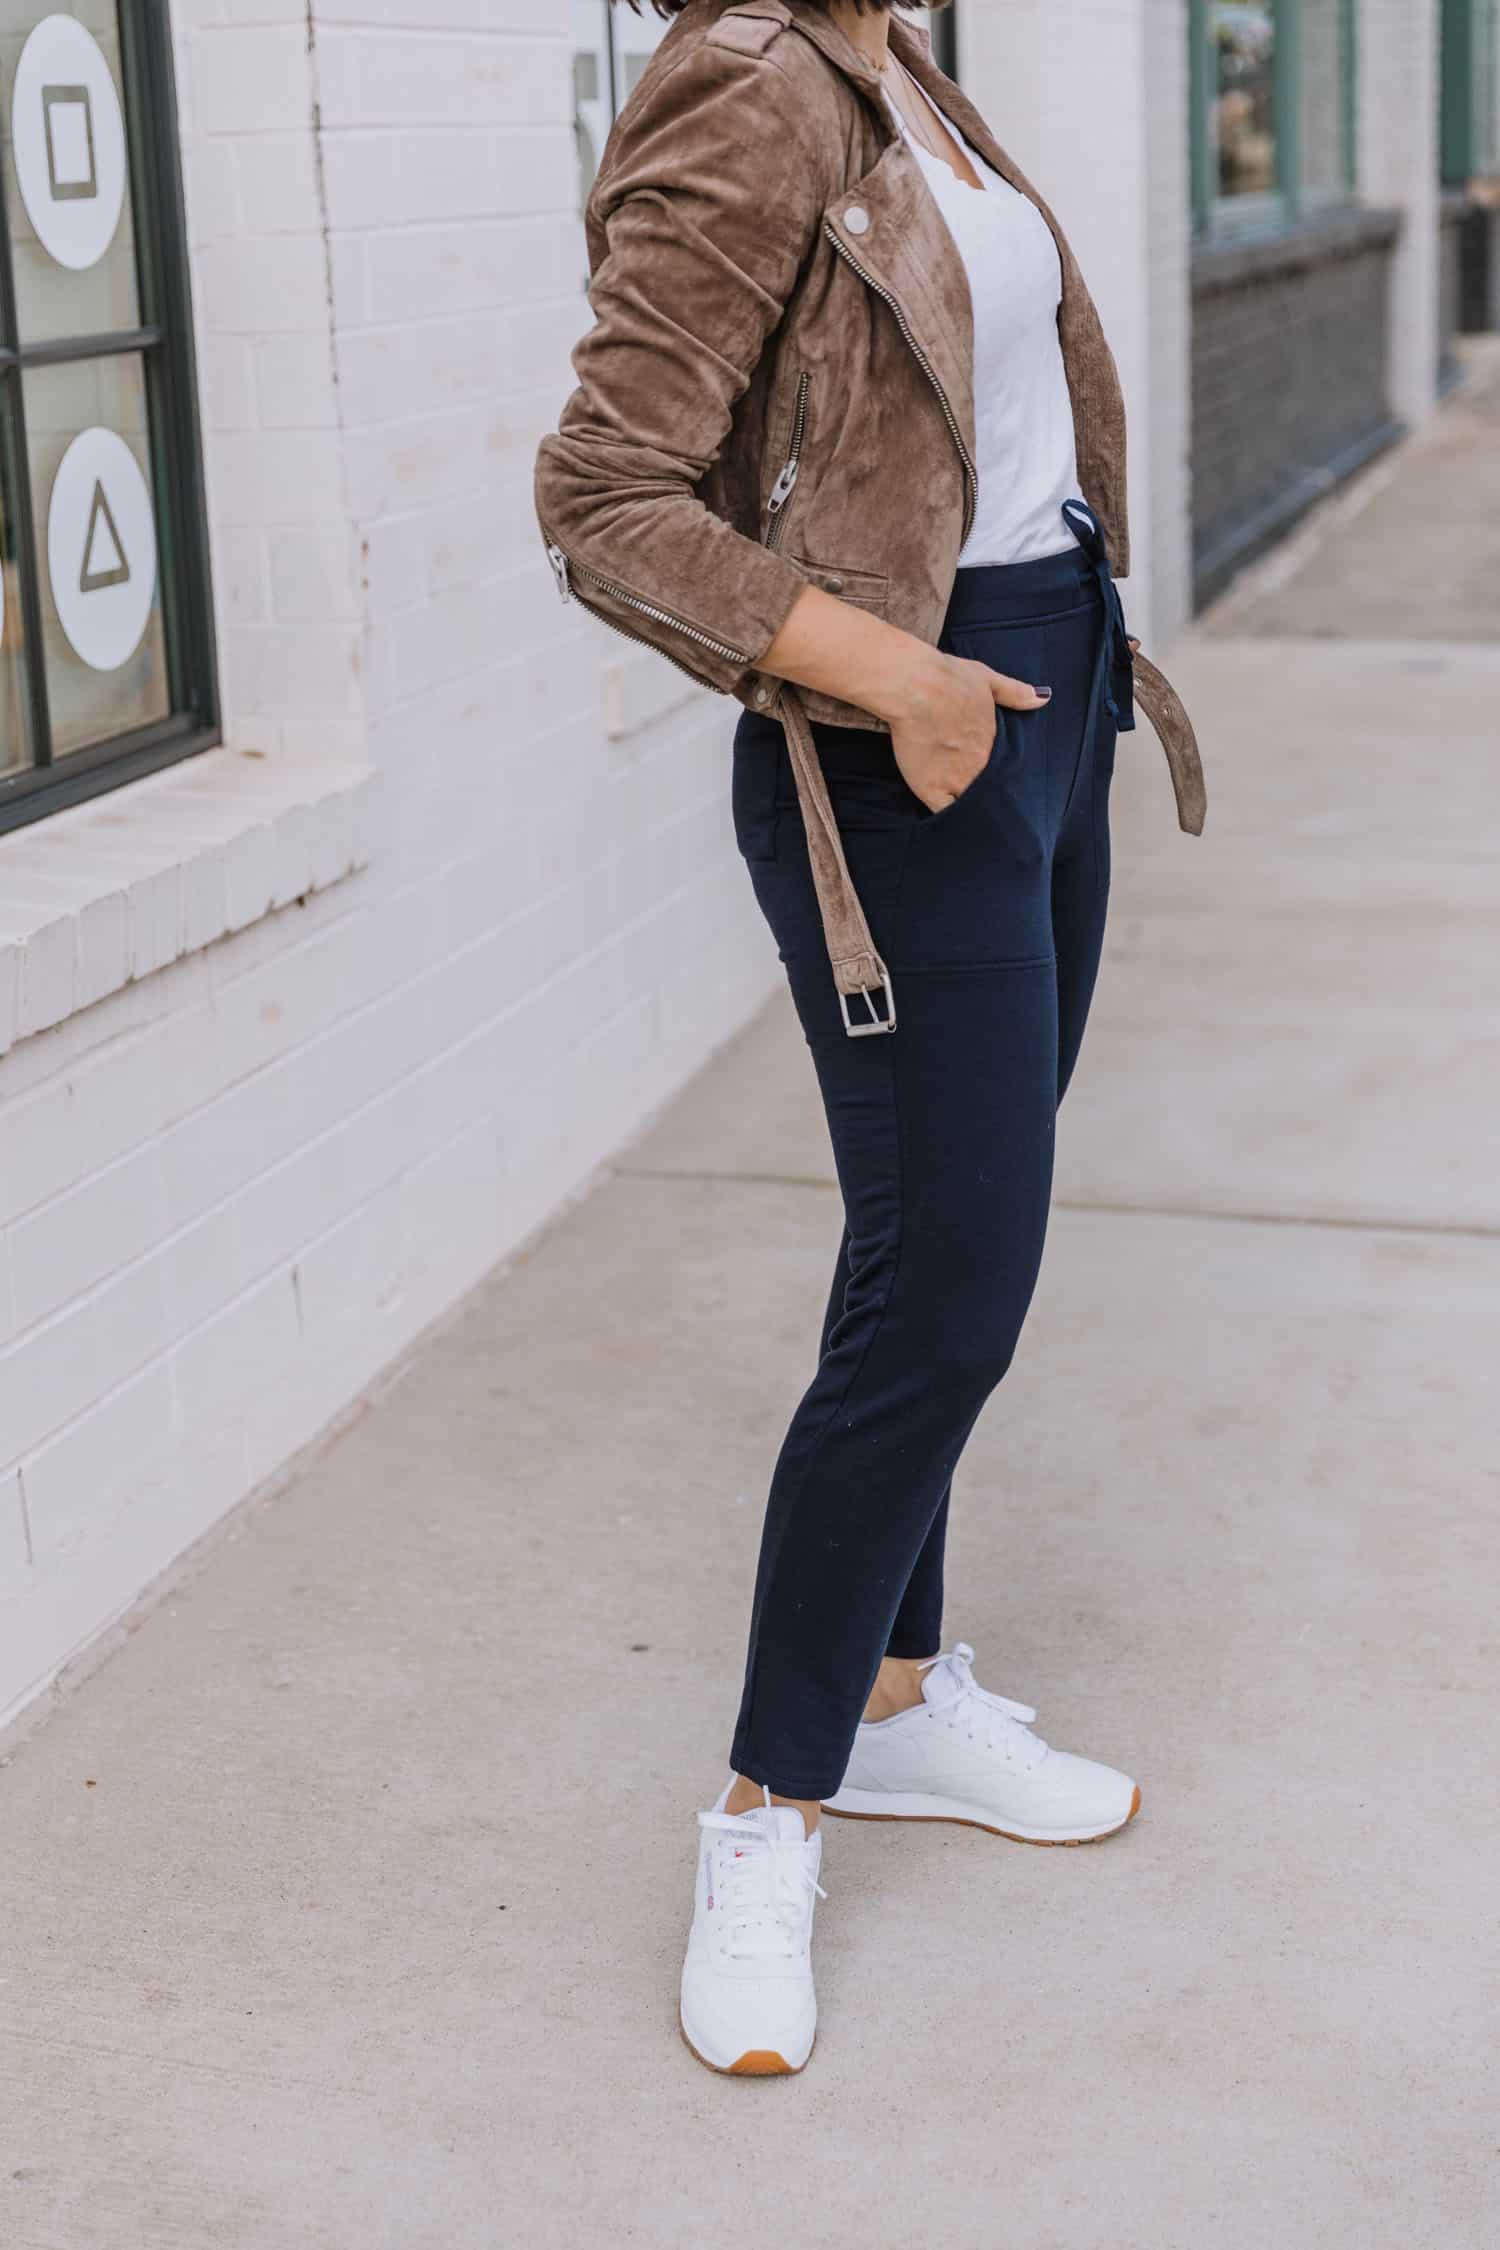 joggers outfit idea